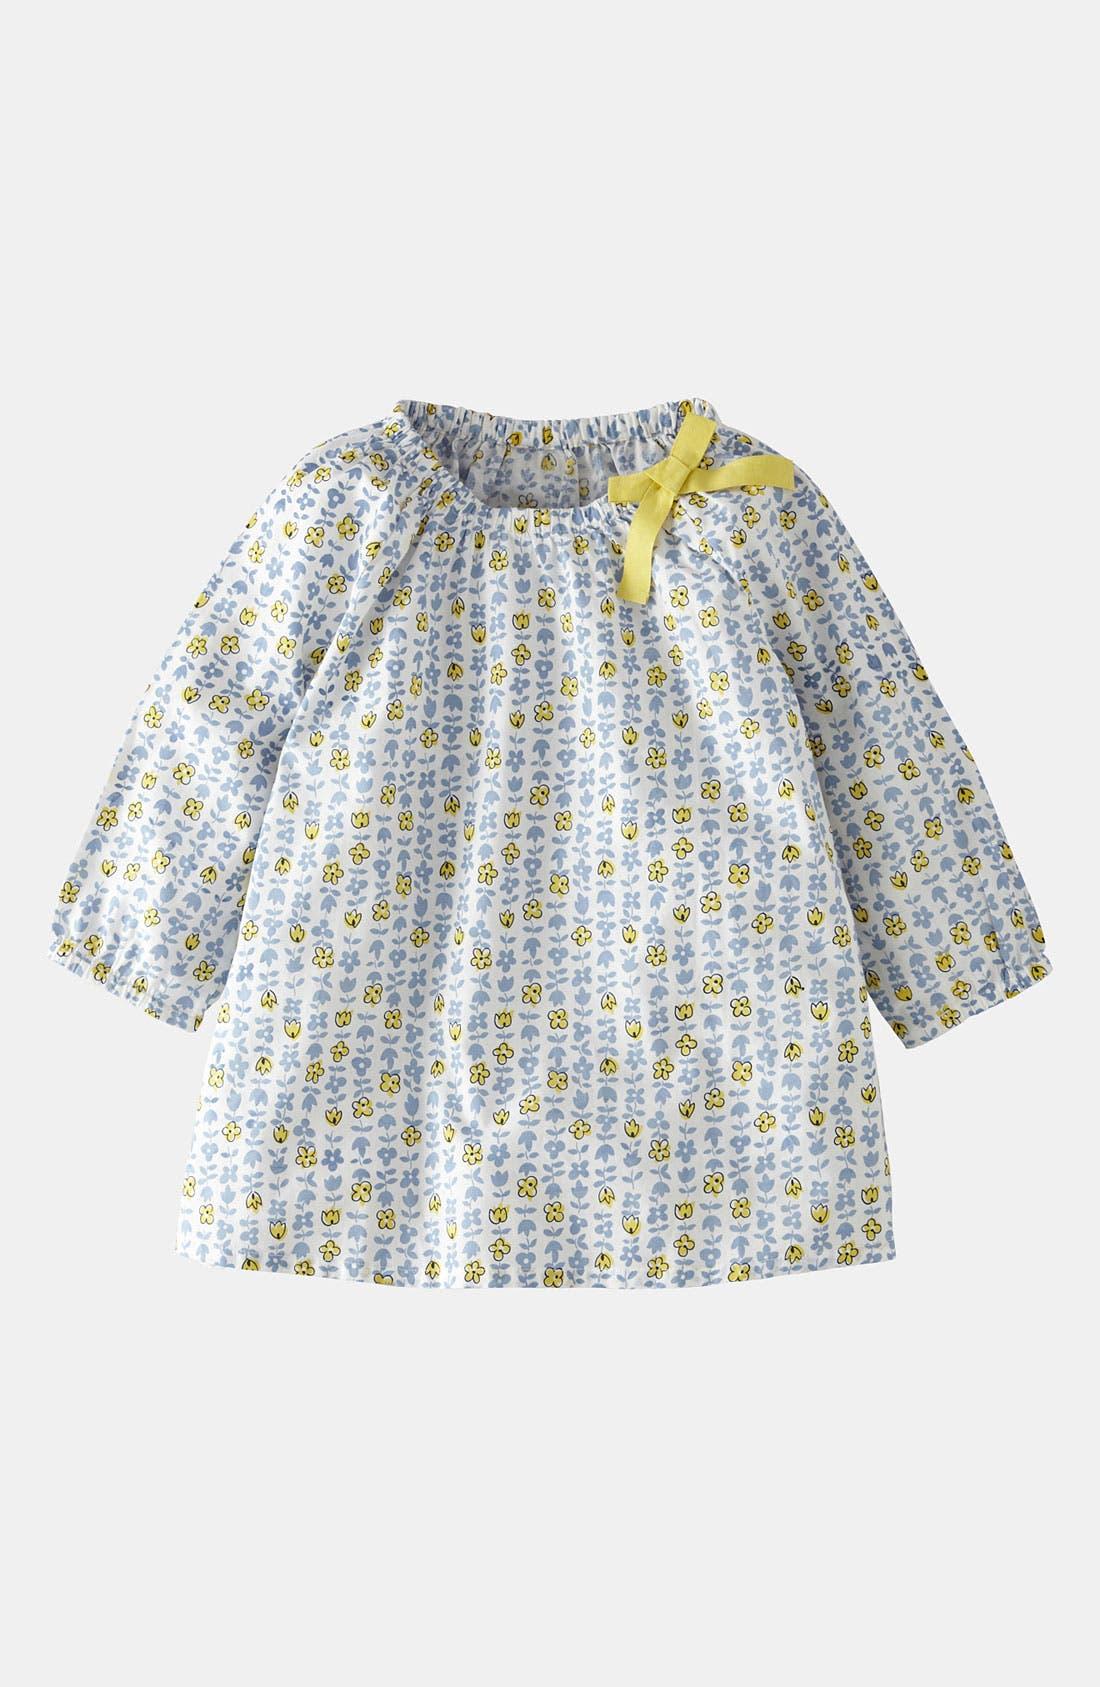 Main Image - Mini Boden 'Pretty' Woven Top (Little Girls & Big Girls)